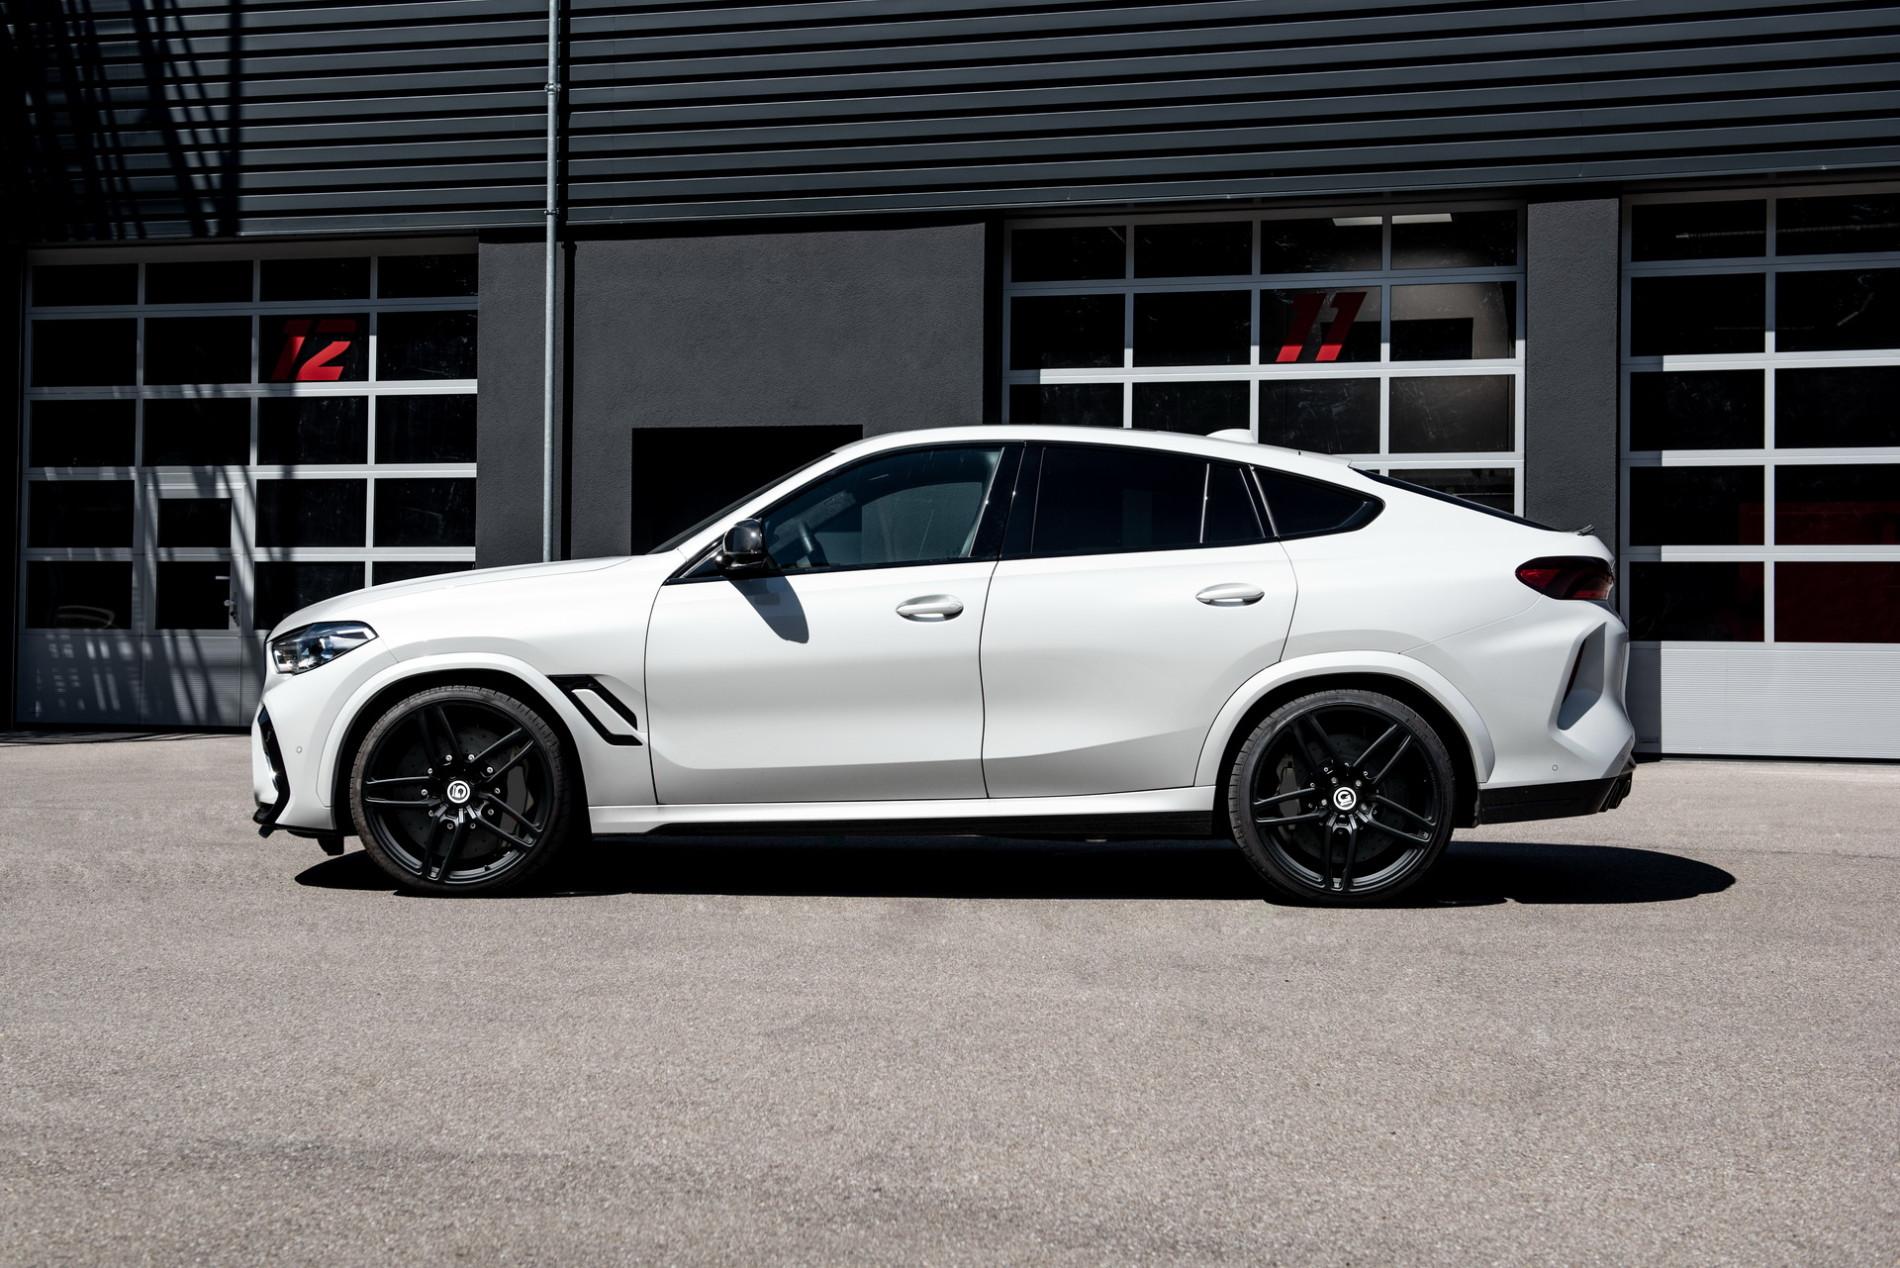 BMW X6 M de la G-Power - BMW X6 M de la G-Power